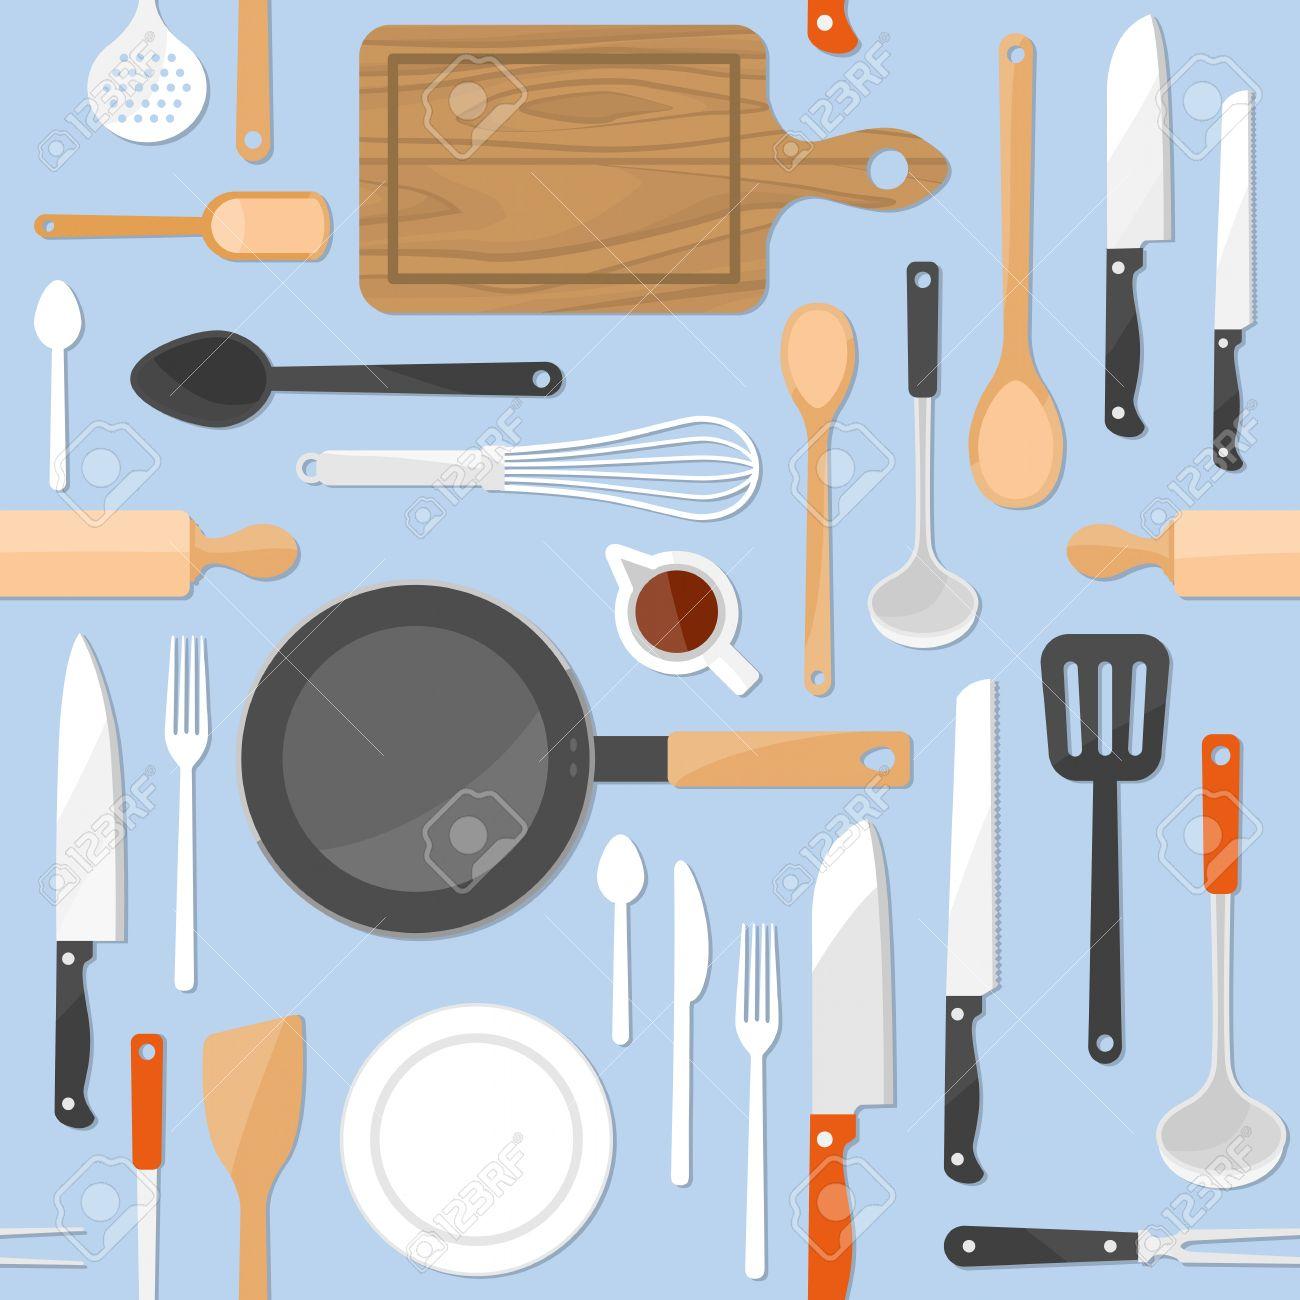 Nett Jamie Oliver Küchengeräte Ideen - Heimat Ideen ...